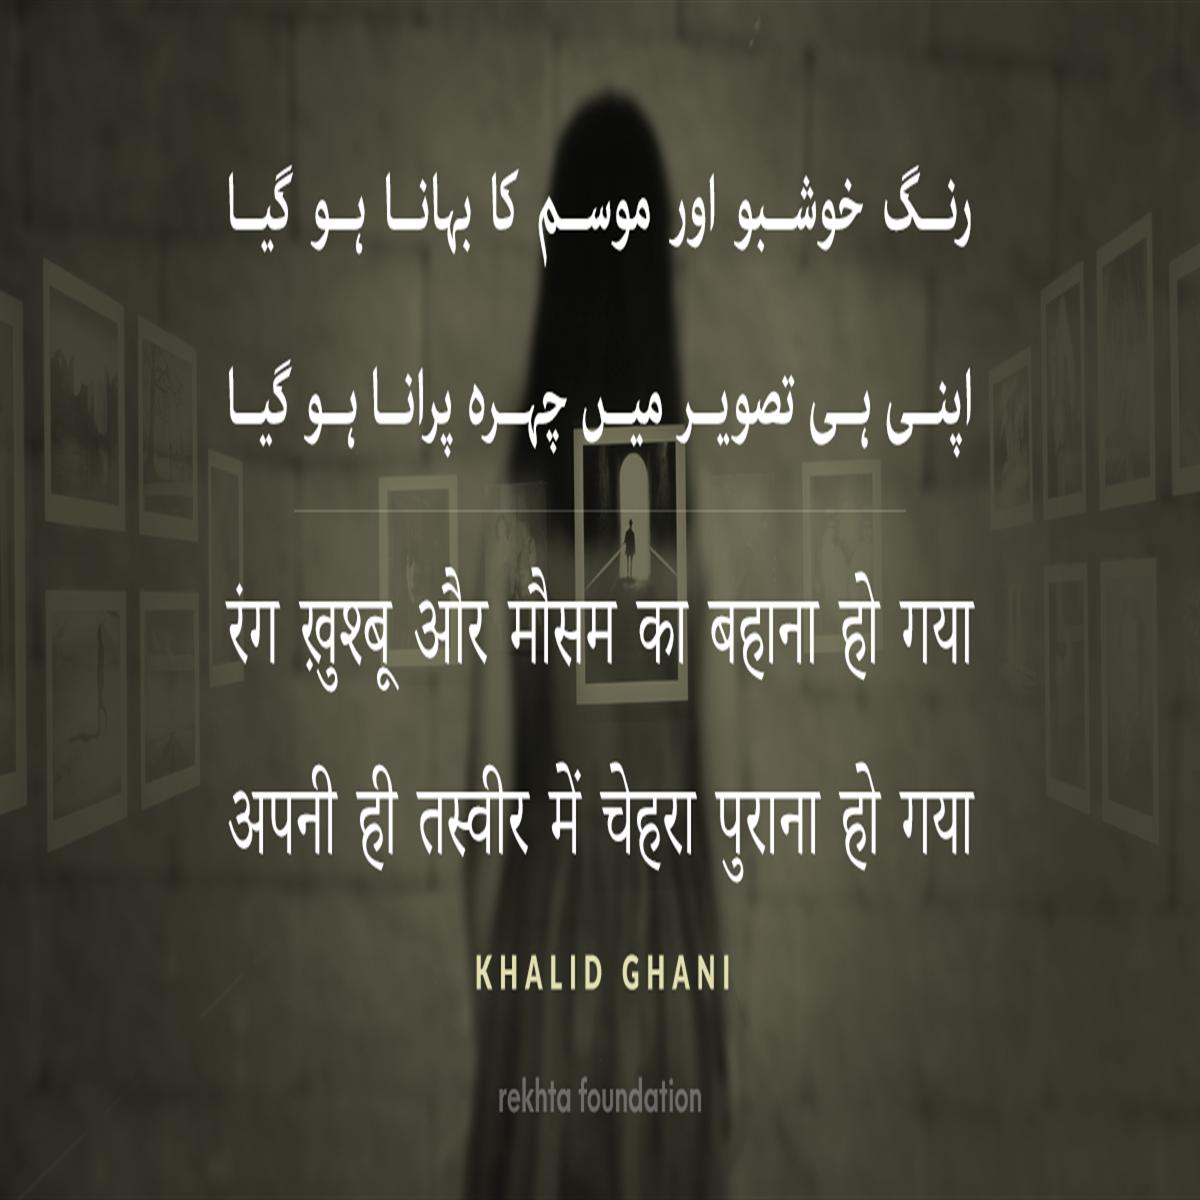 Khalid Ghani